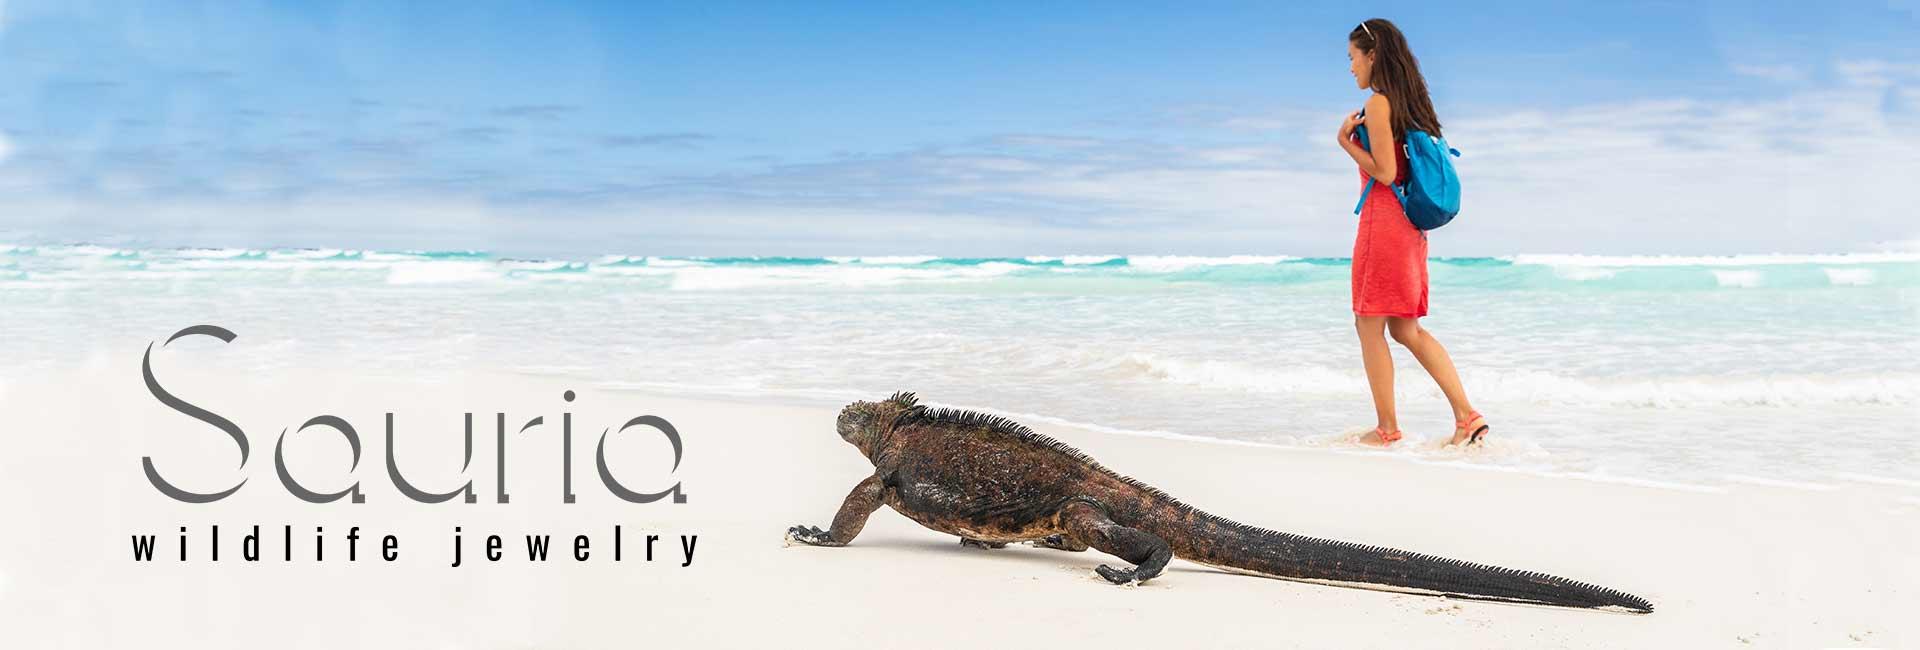 aller-letztes-iguana.jpg